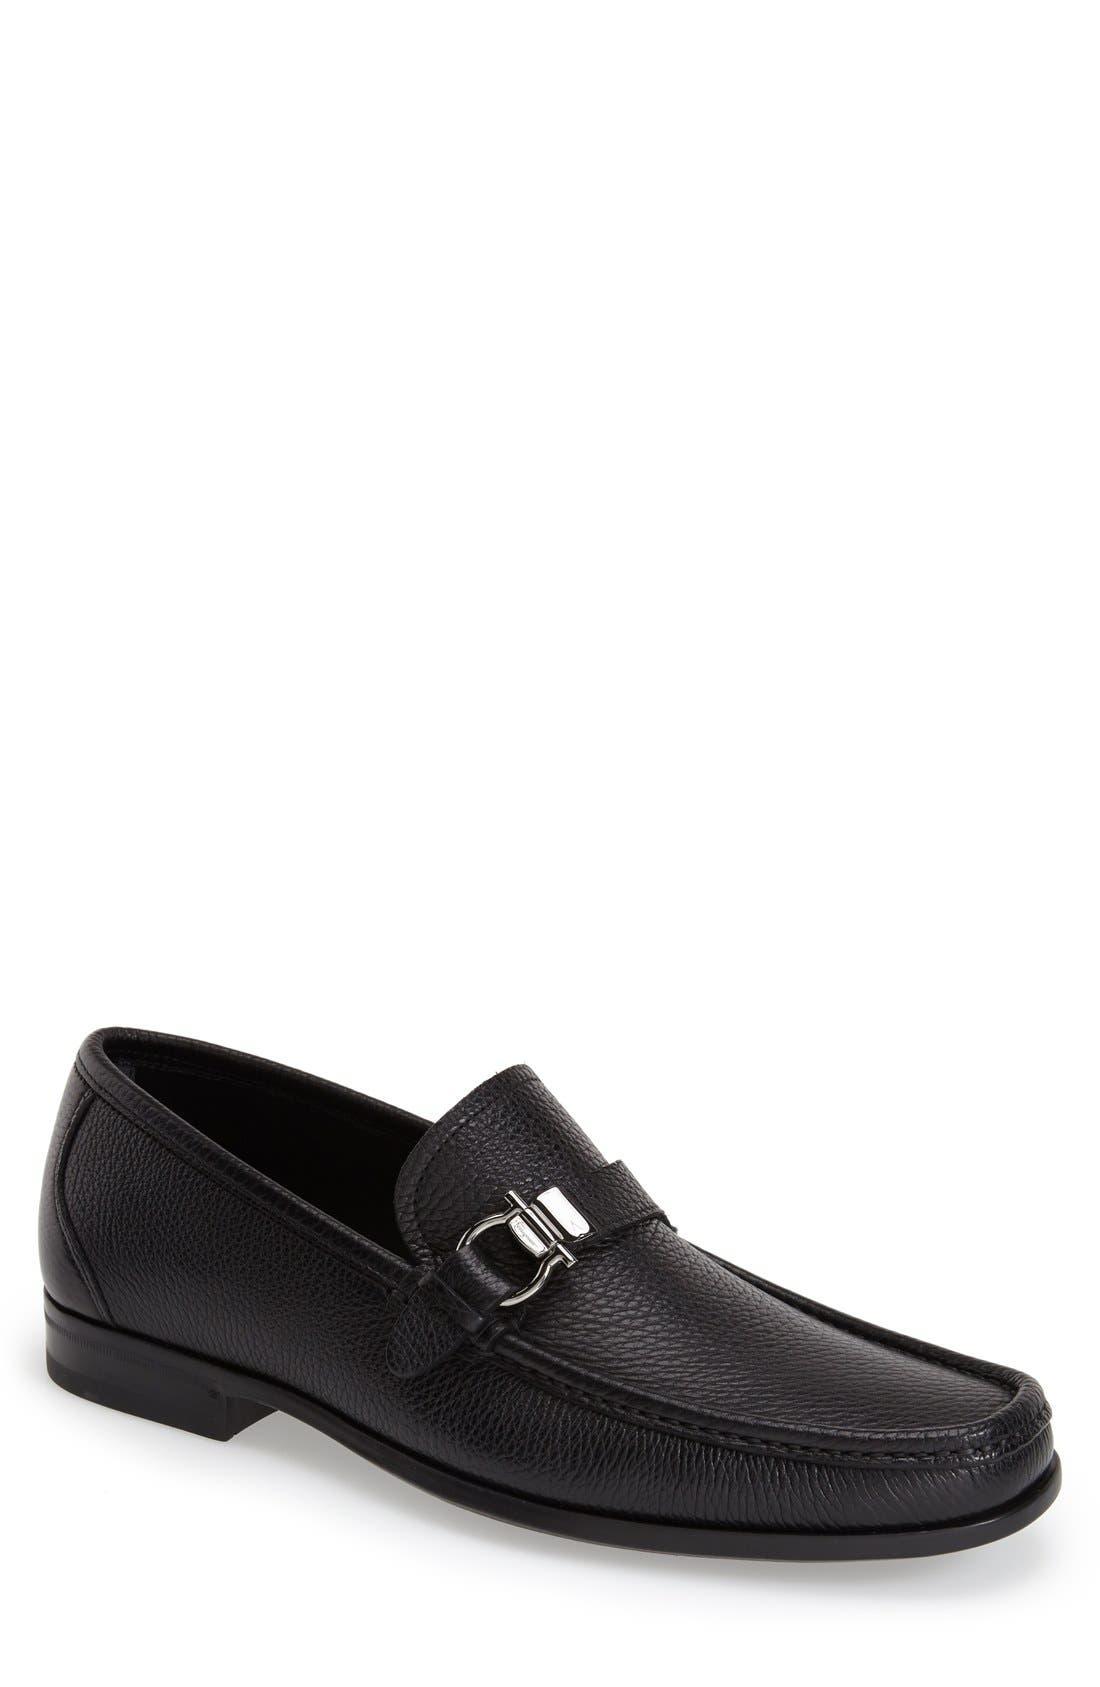 Salvatore FerragamoMuller Bit Leather Loafers iPwfAKvD